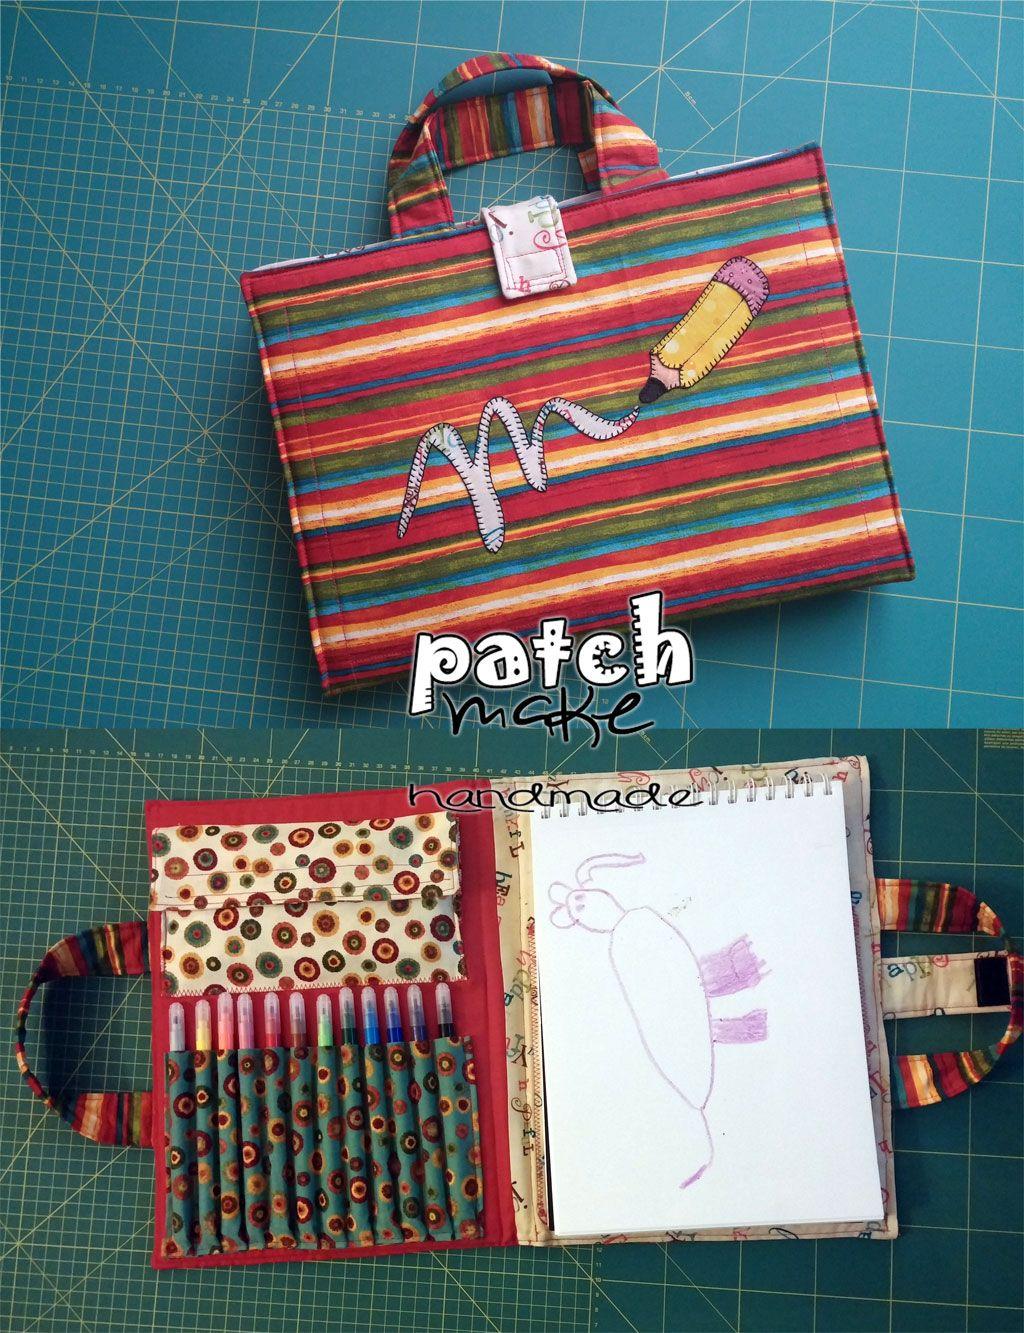 Artesan a de patchwork proyectos diy ideas para regalar - Proyectos de patchwork ...